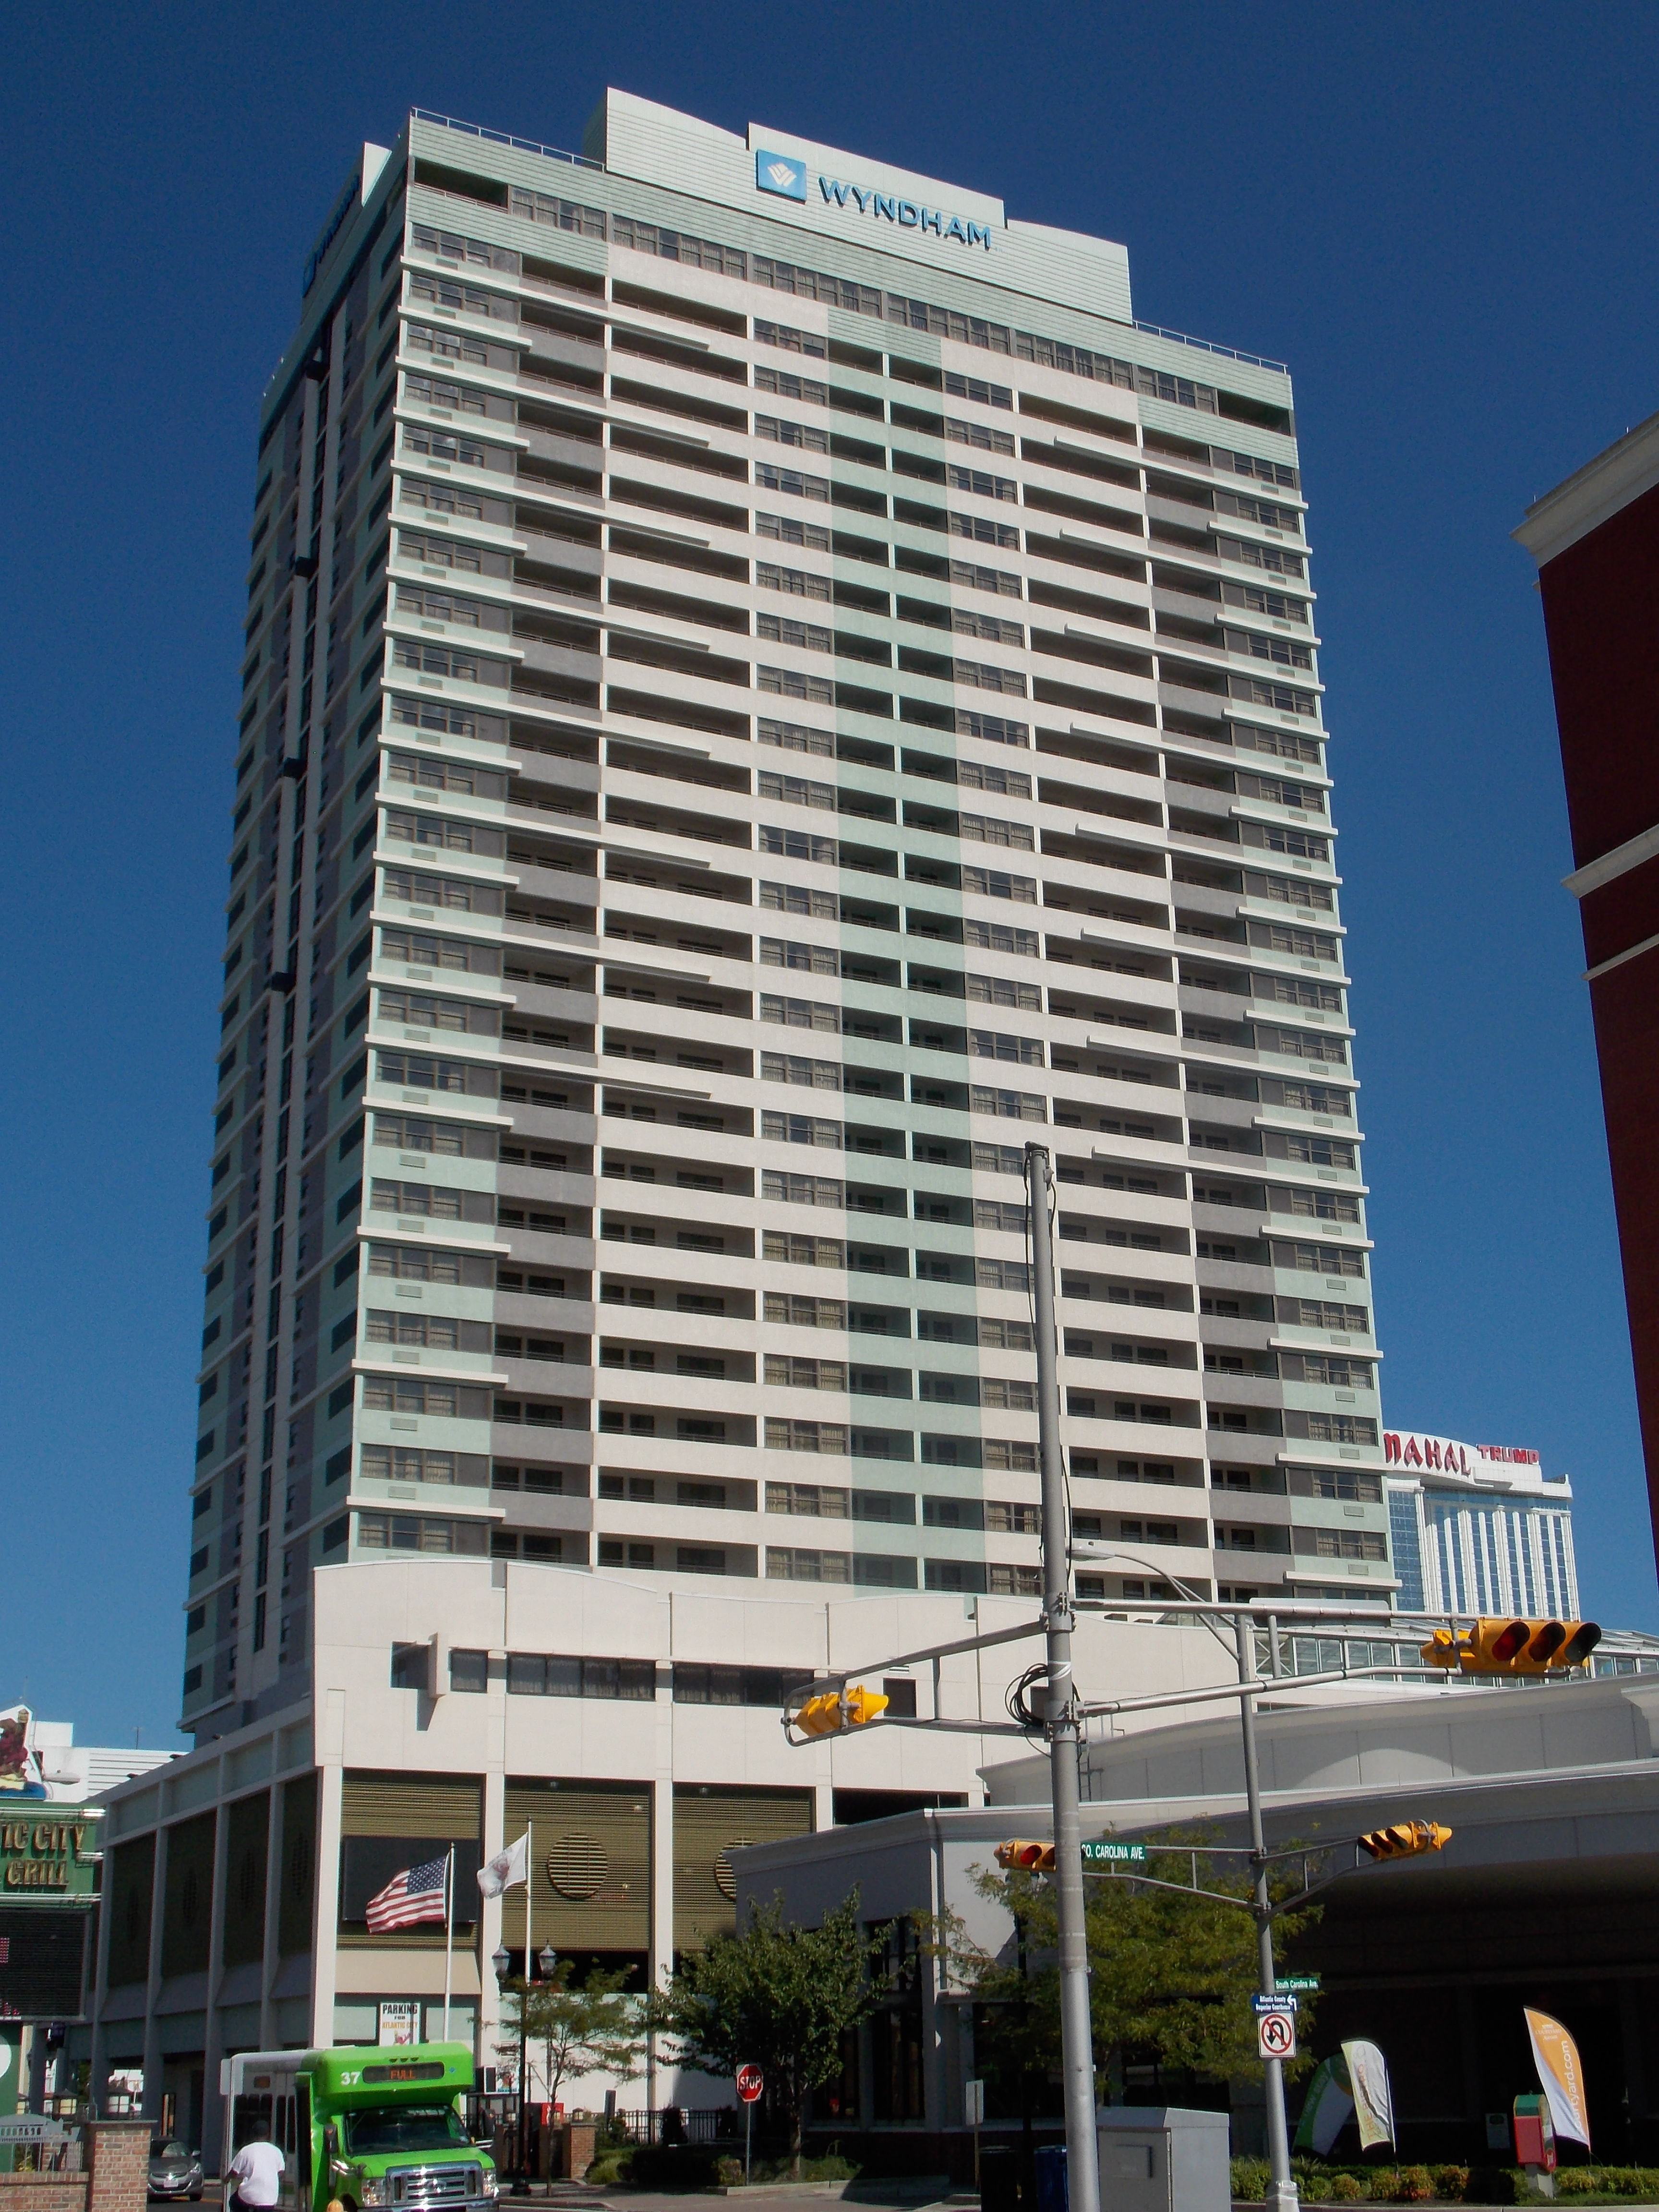 Pacific City Hotel Huntington Beach Ca